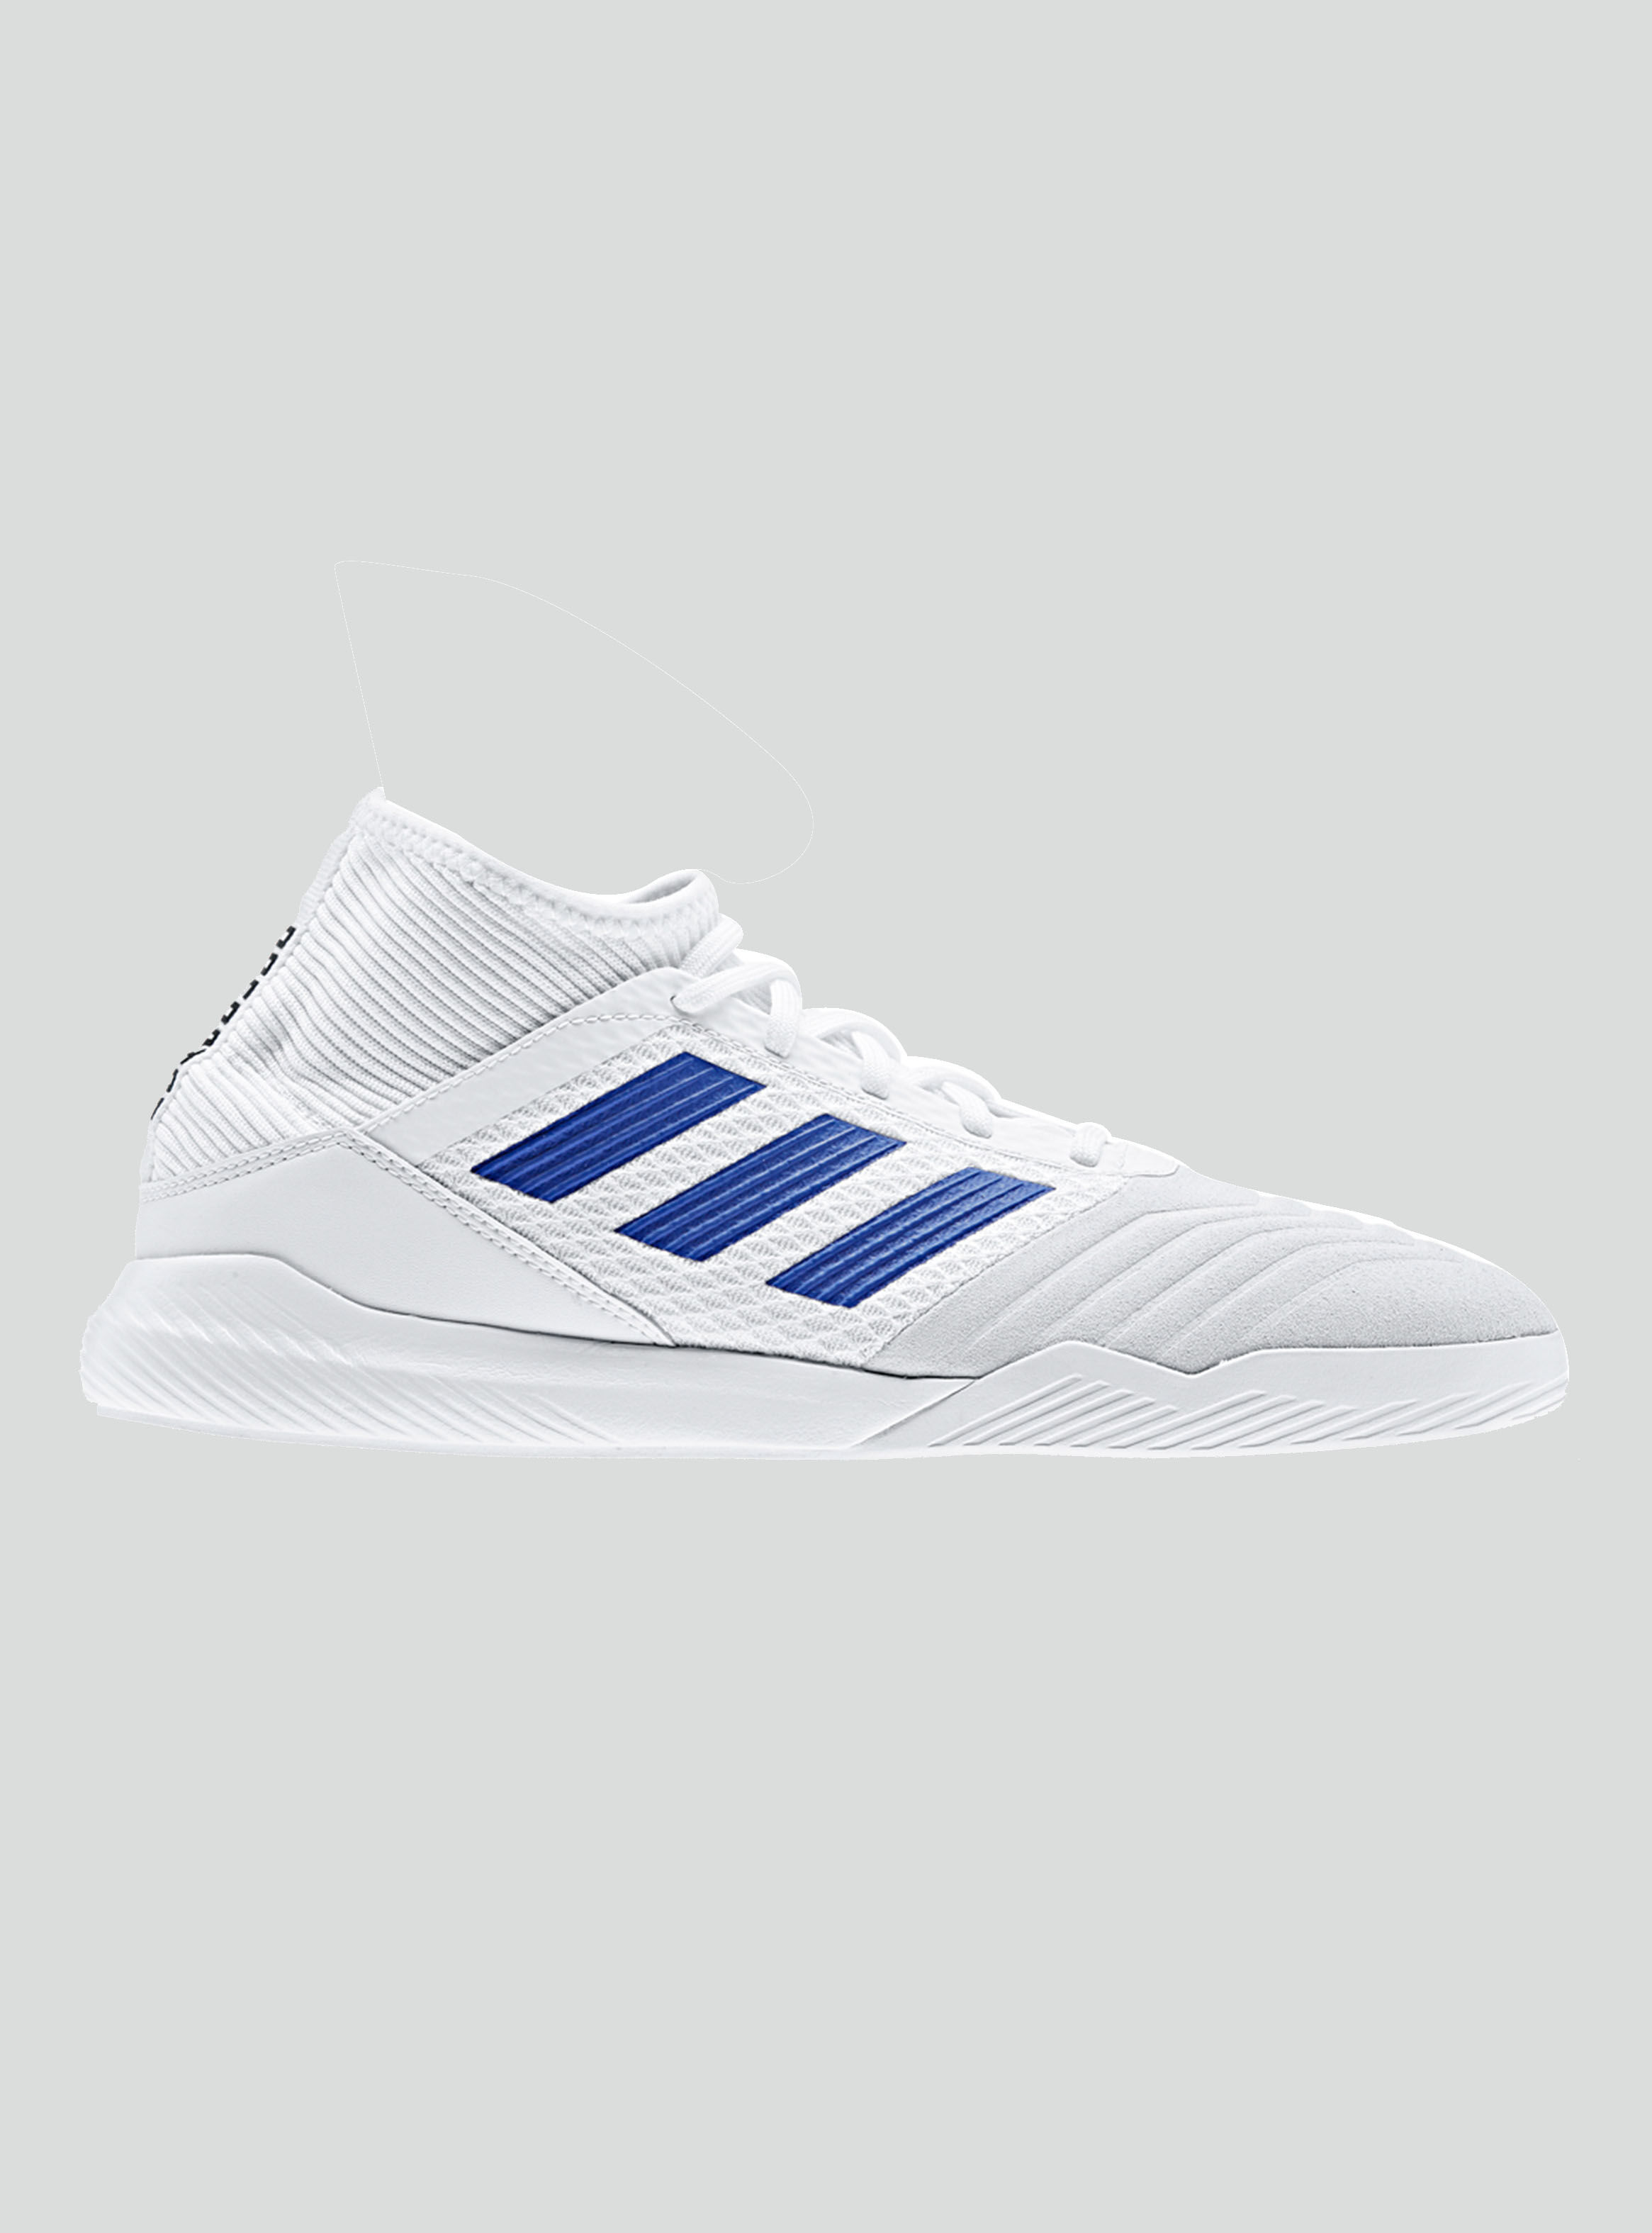 Fútbol Predator Zapatilla Adidas Blanco Pn0Okw8X